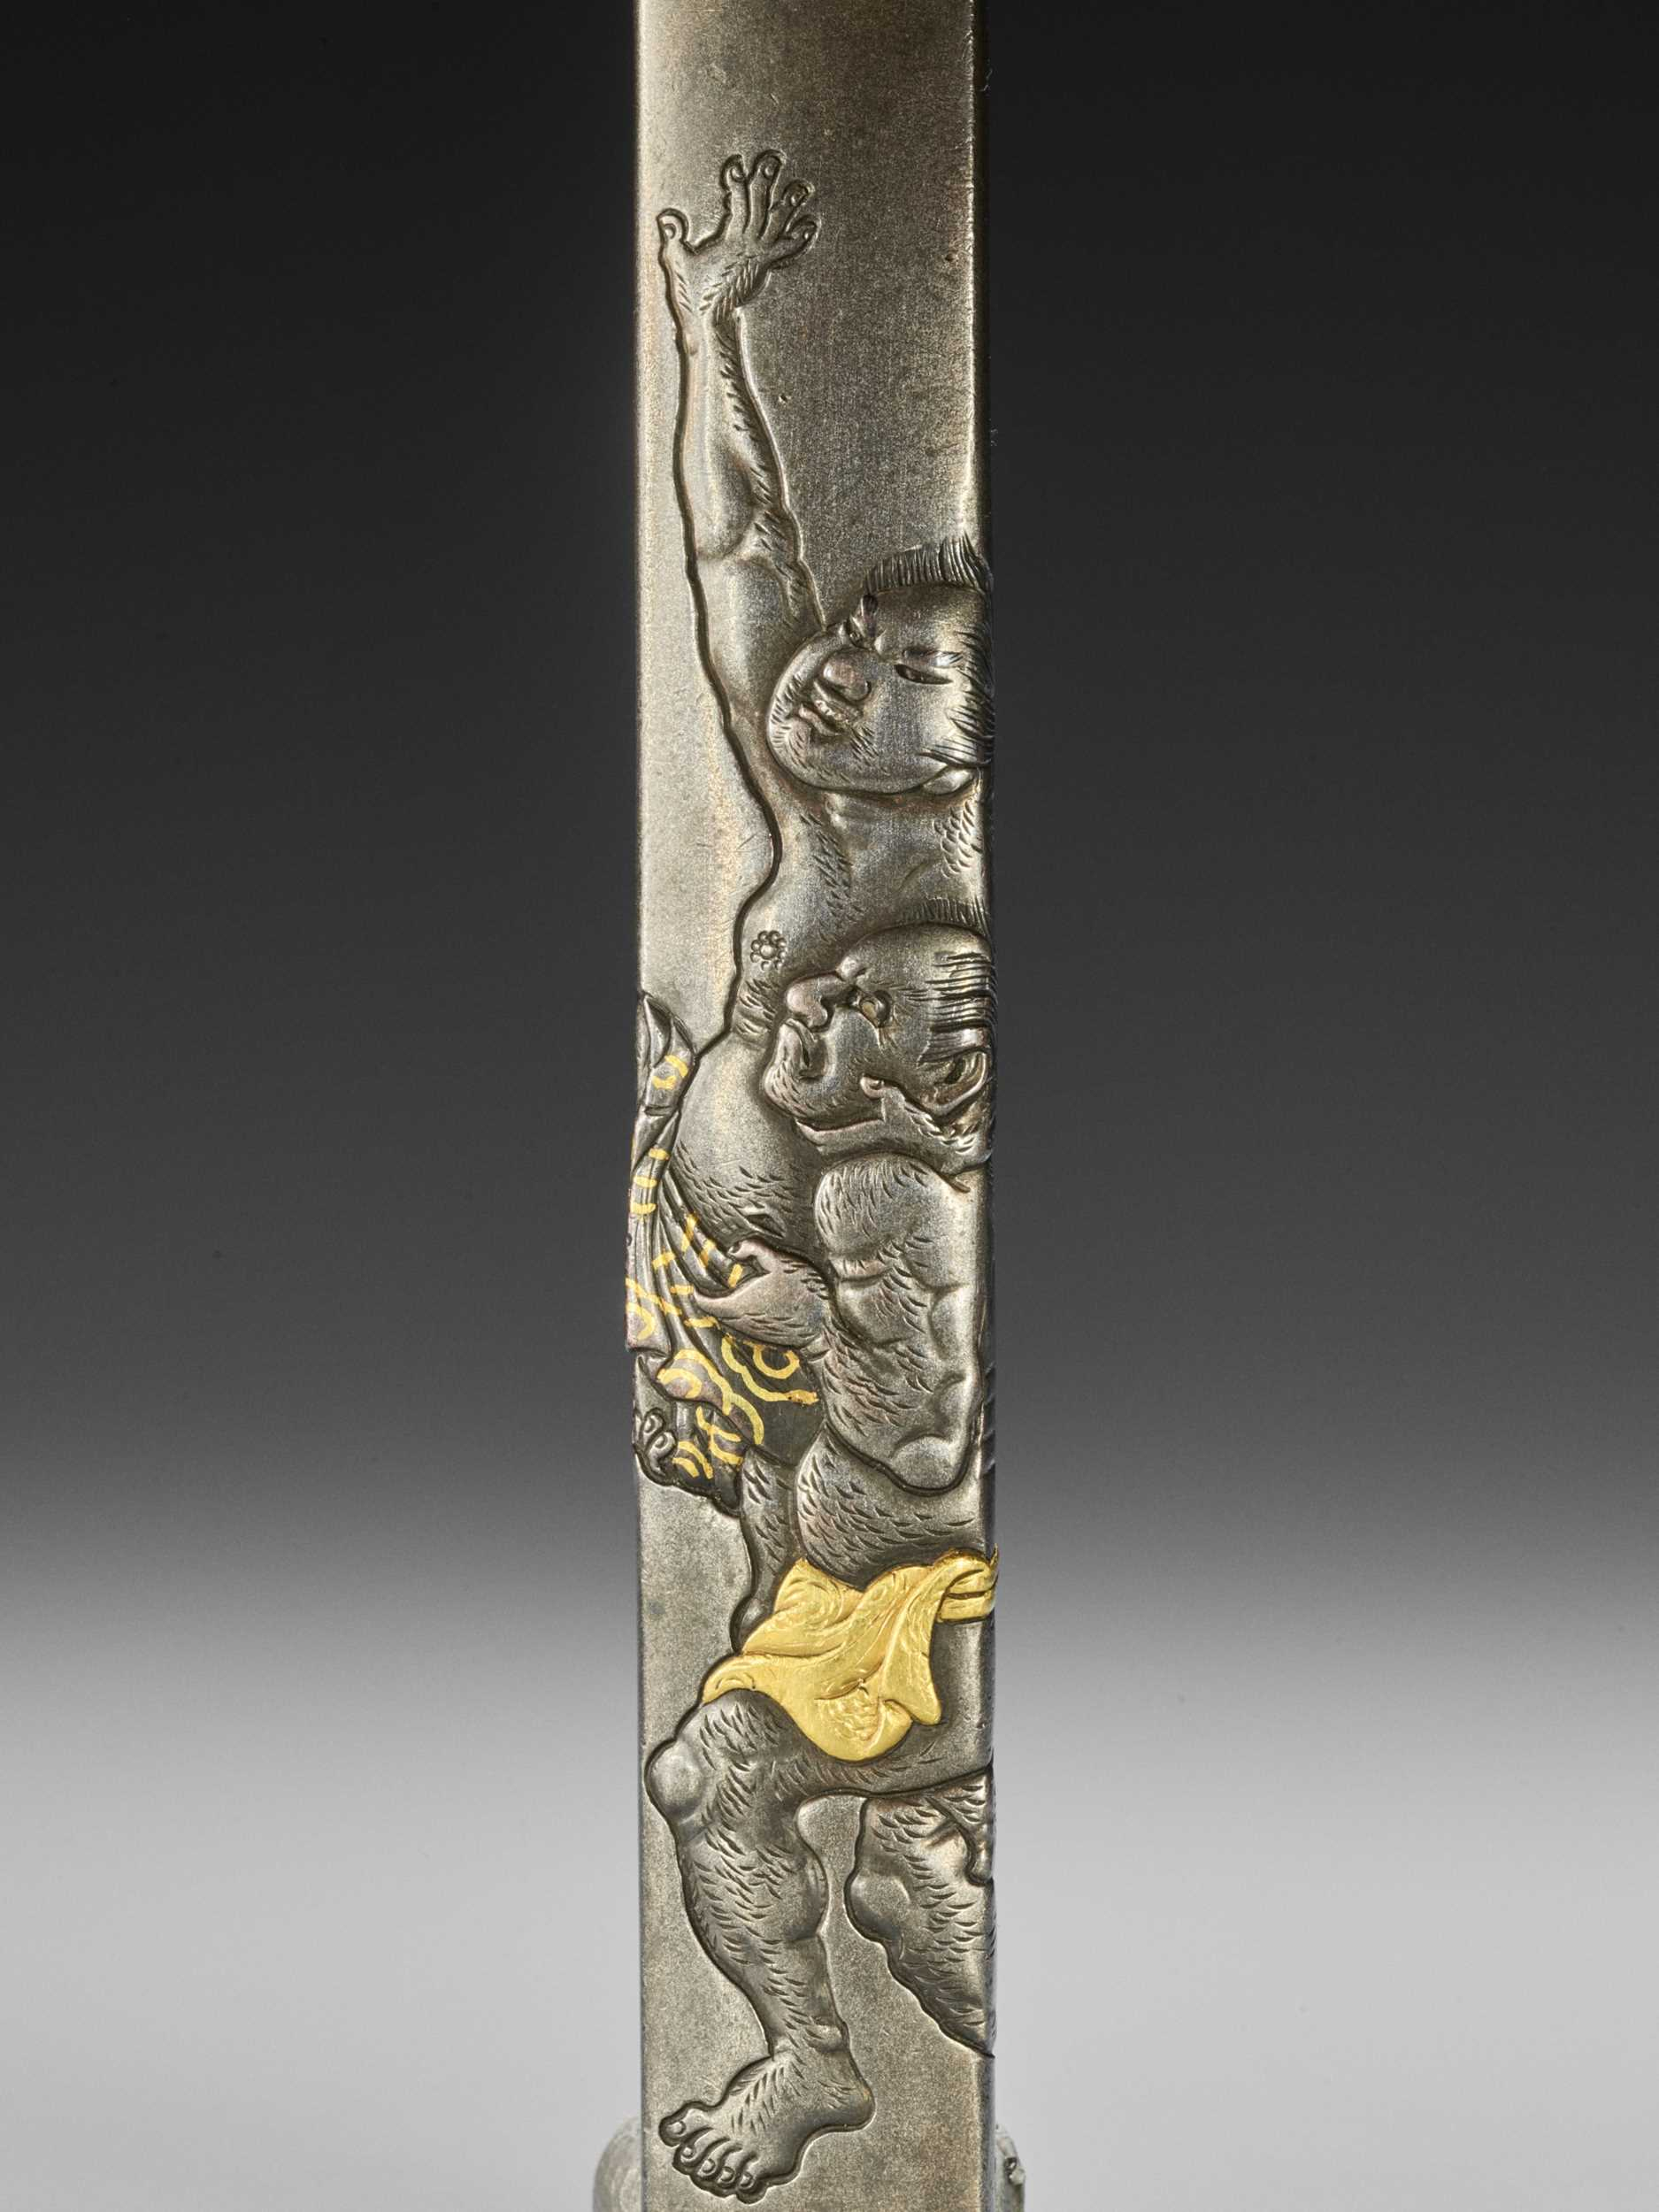 HAMANO NAOYUKI: A GOLD-INLAID SHIBUICHI KOZUKA WITH TWO SUMO WRESTLERS